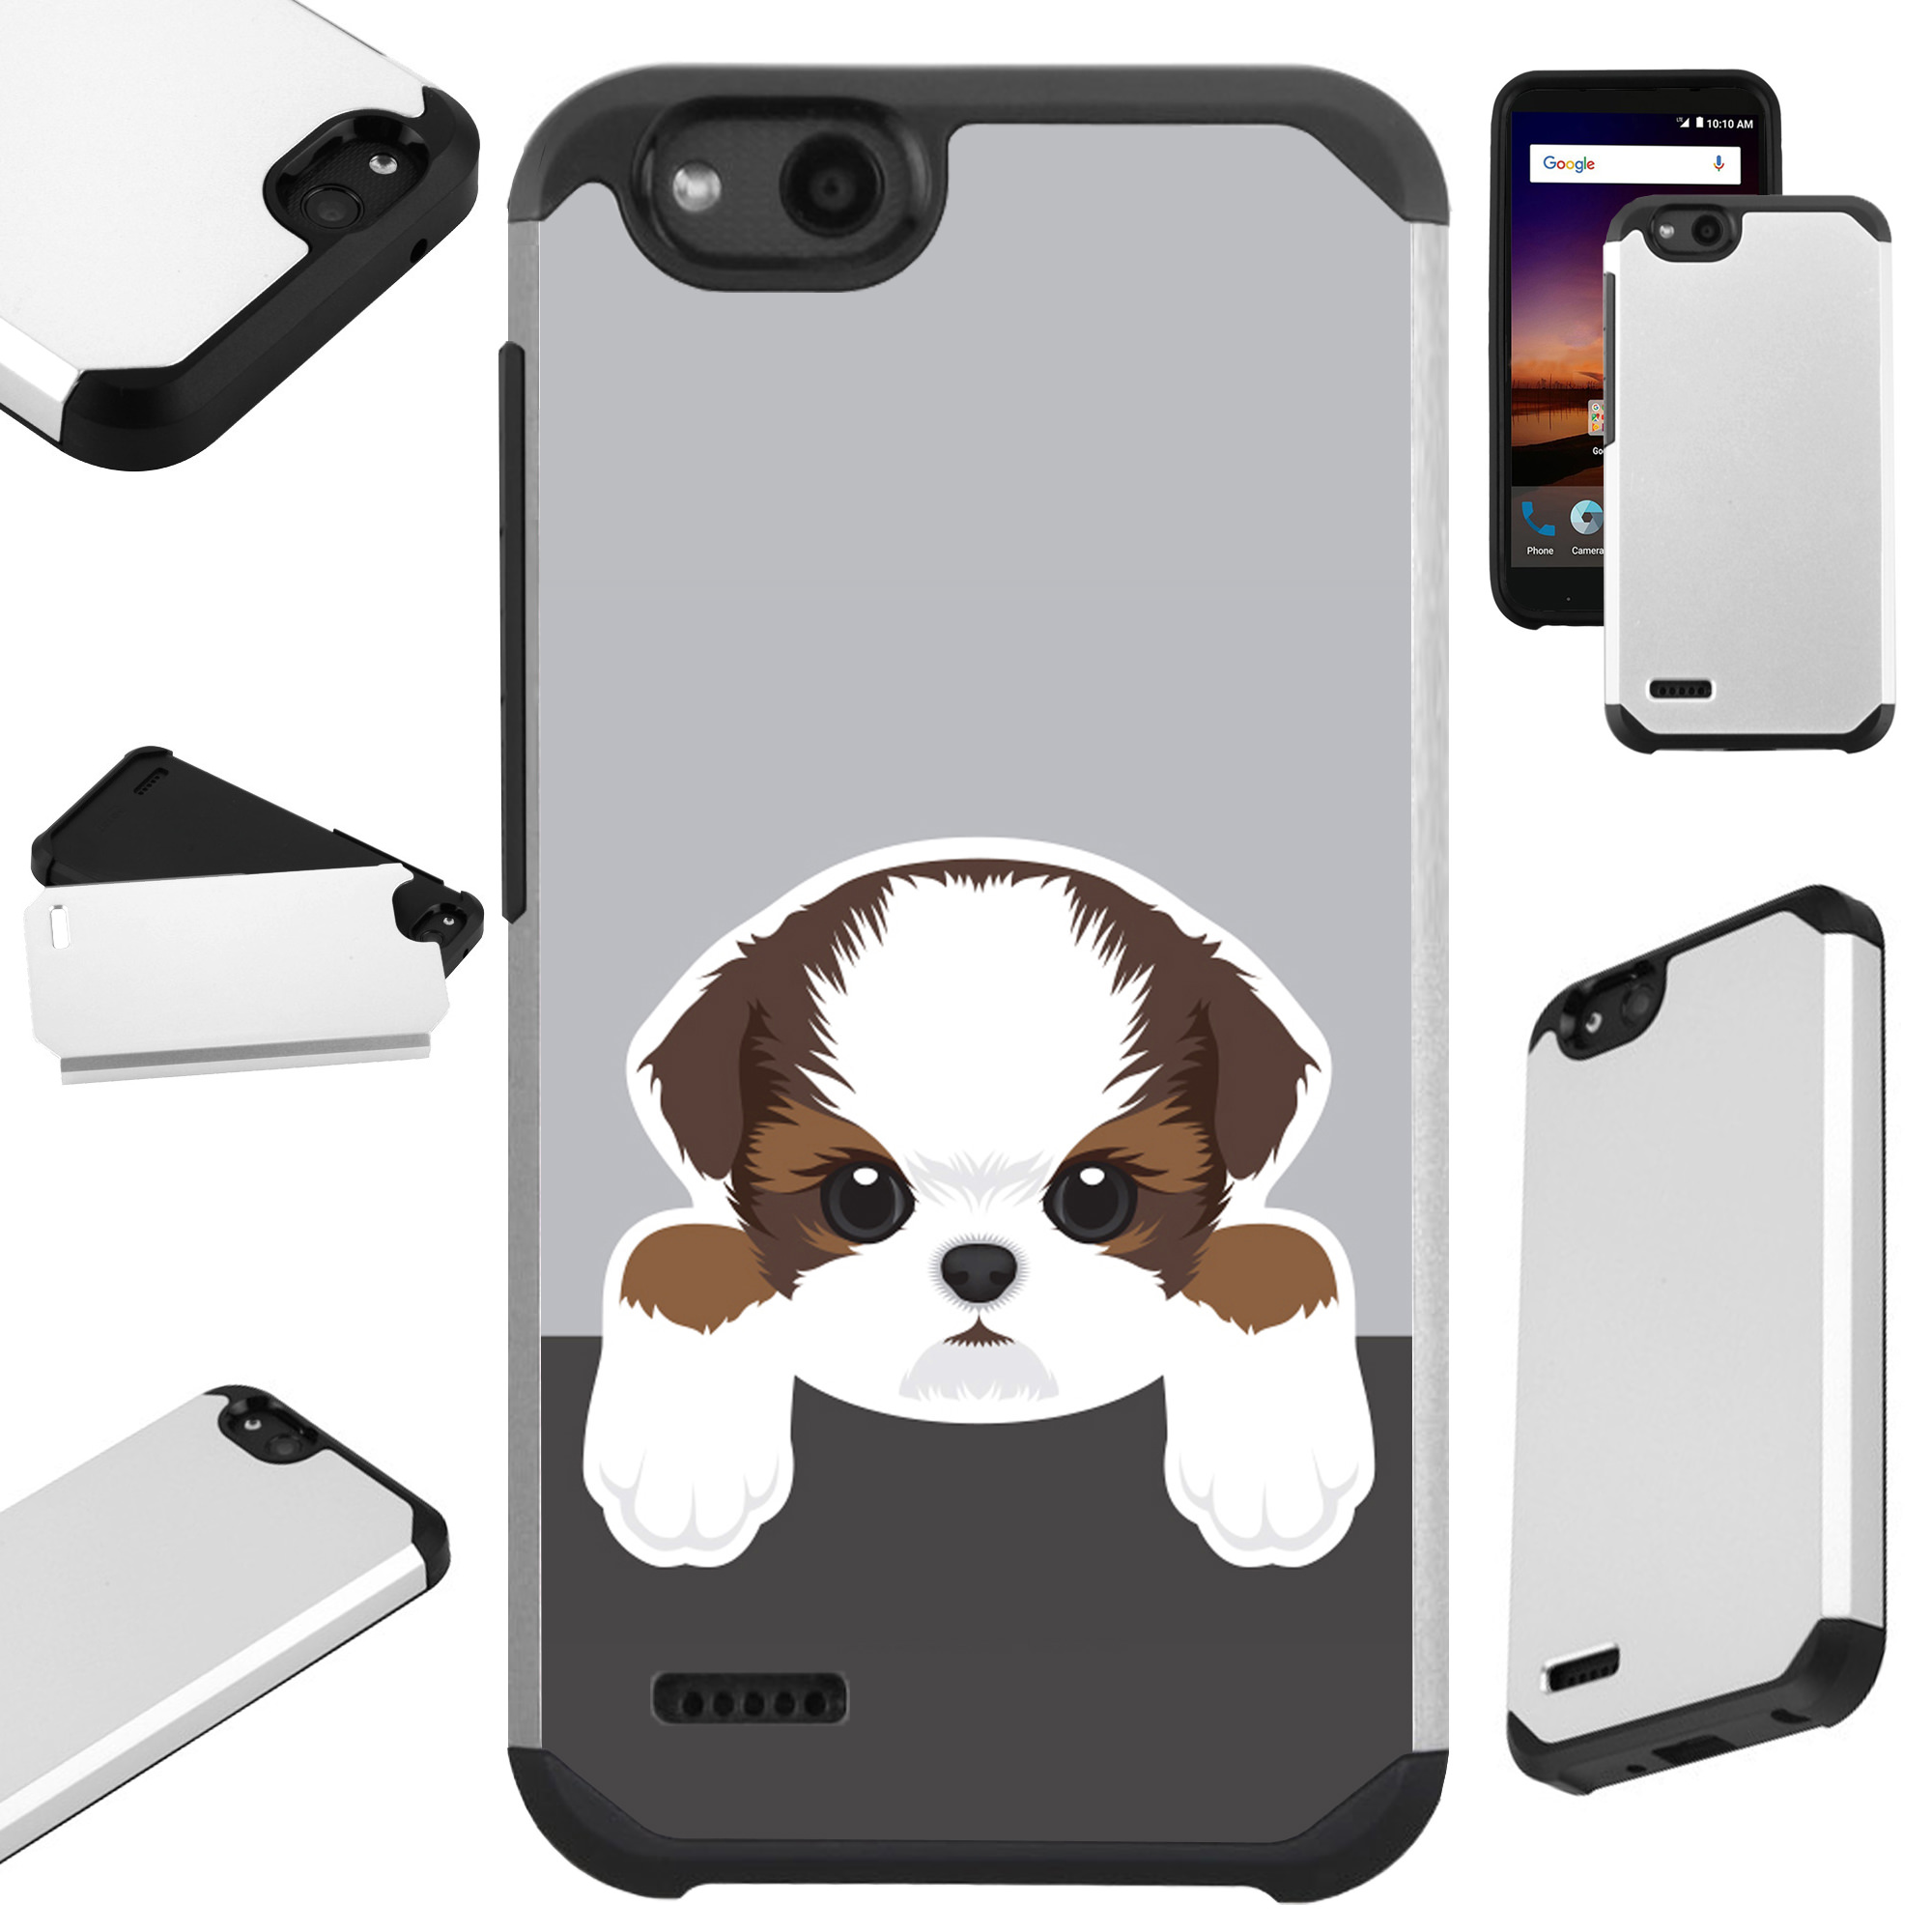 For ZTE ZFive G LTE / ZFive C / Avid 4 / Fanfare 3 / Blade Vantage / Tempo X / Tempo Go Case Hybrid TPU Fusion Phone Cover (Cute Doge Shih Tzu)